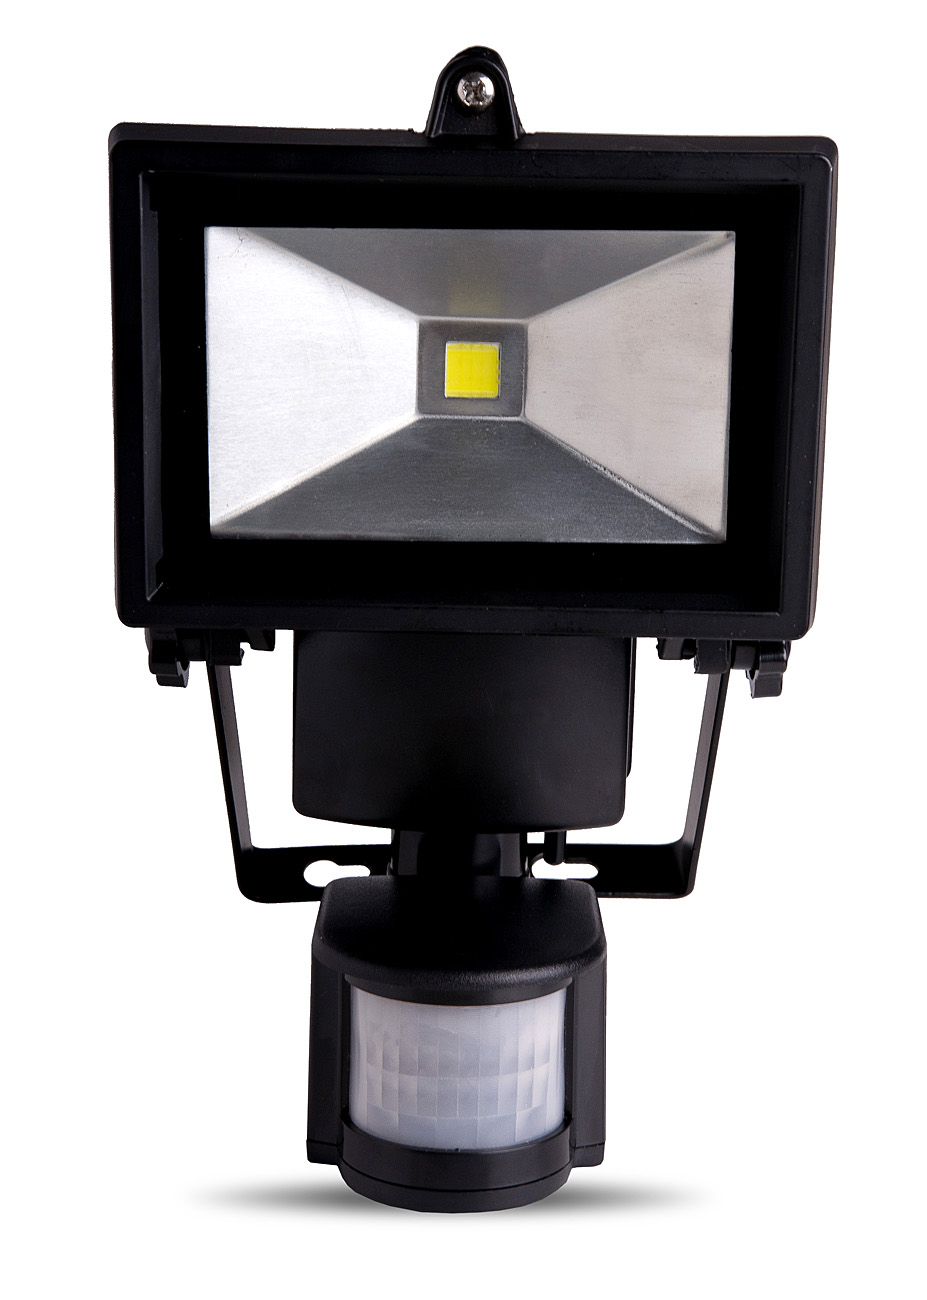 Lampa Solarna Led Cob Z Czujnikiem Ruchu I Zmierzchu Pd3csml